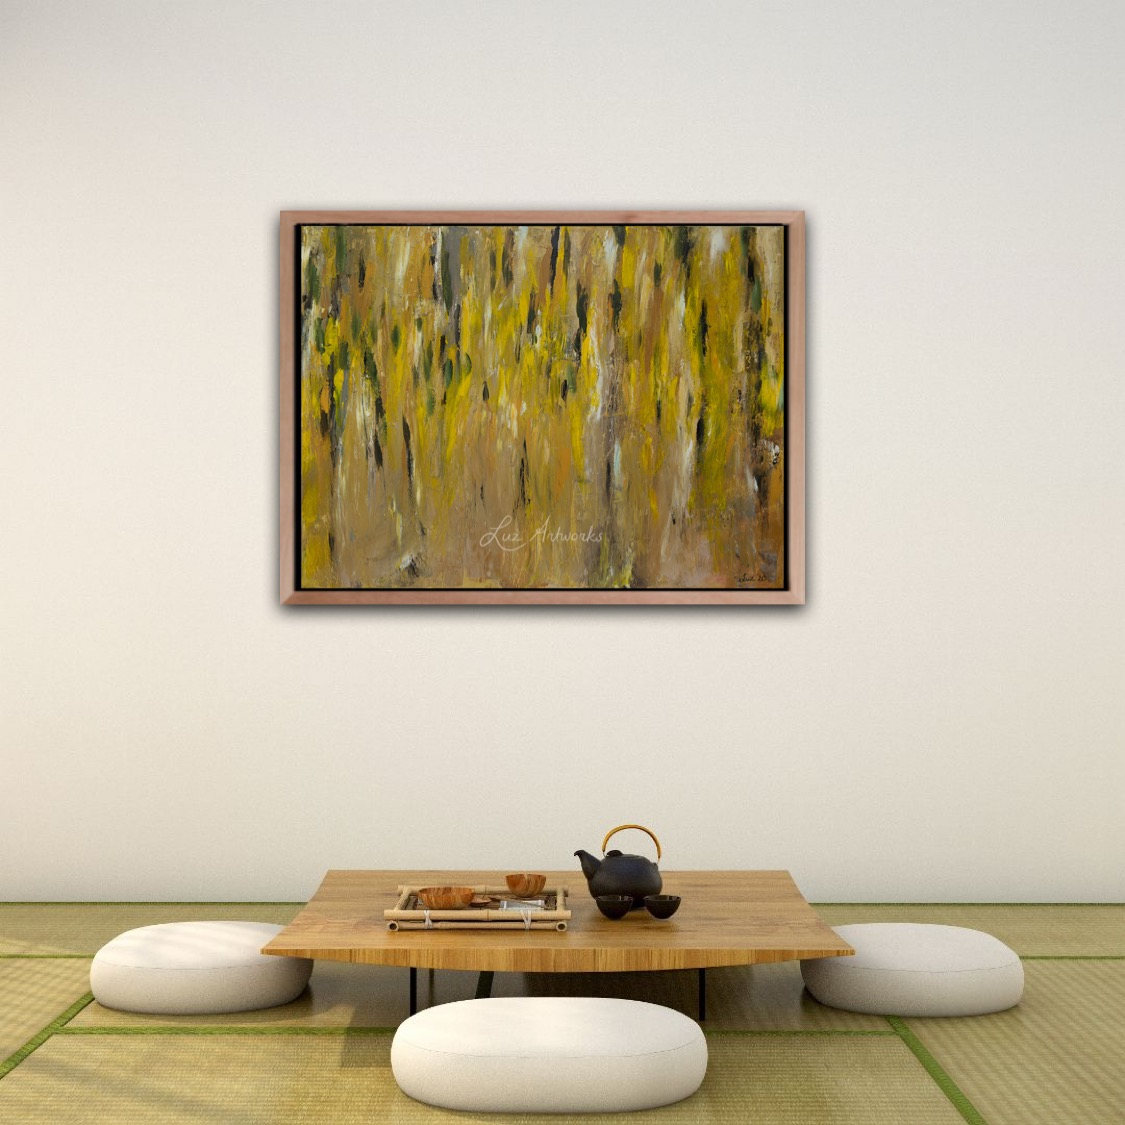 Painting Laburnum by Marloes Bloedjes Luz Artworks - wall